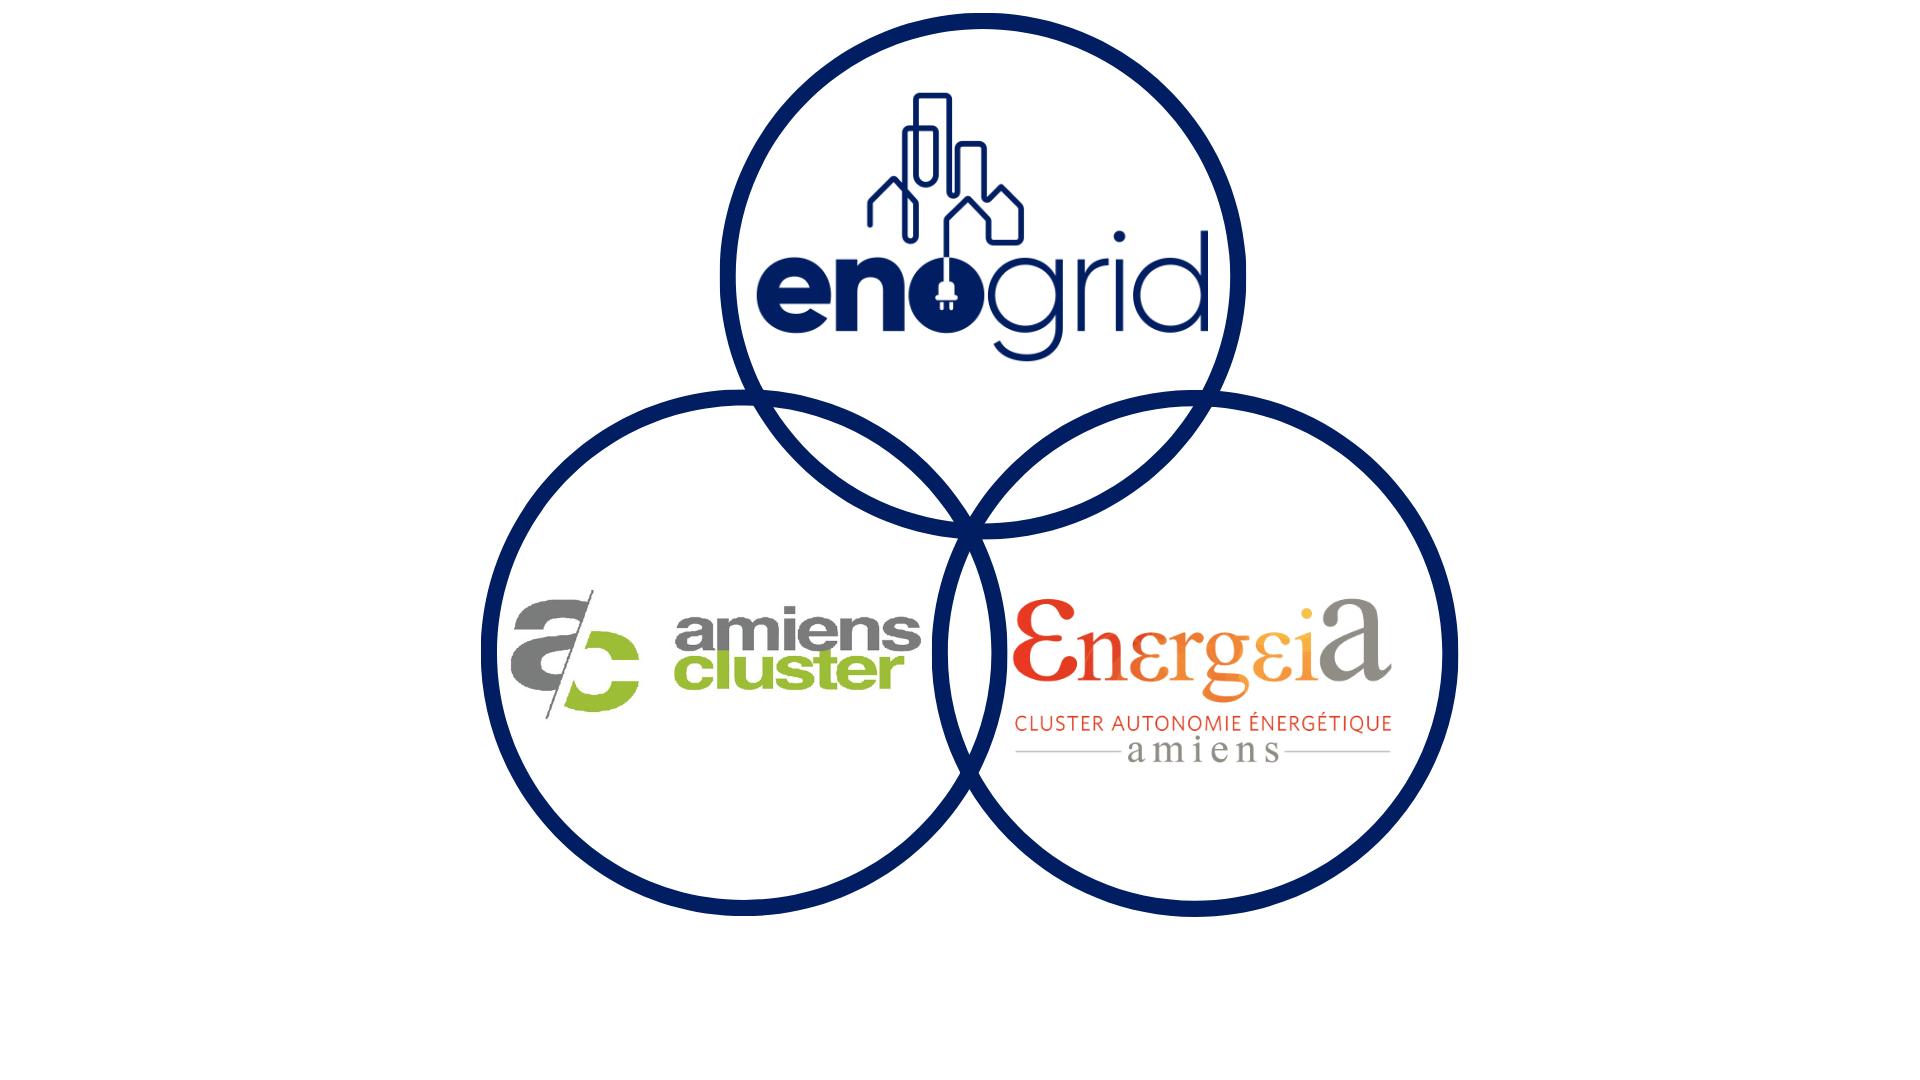 Enogrid intègre Amiens Cluster